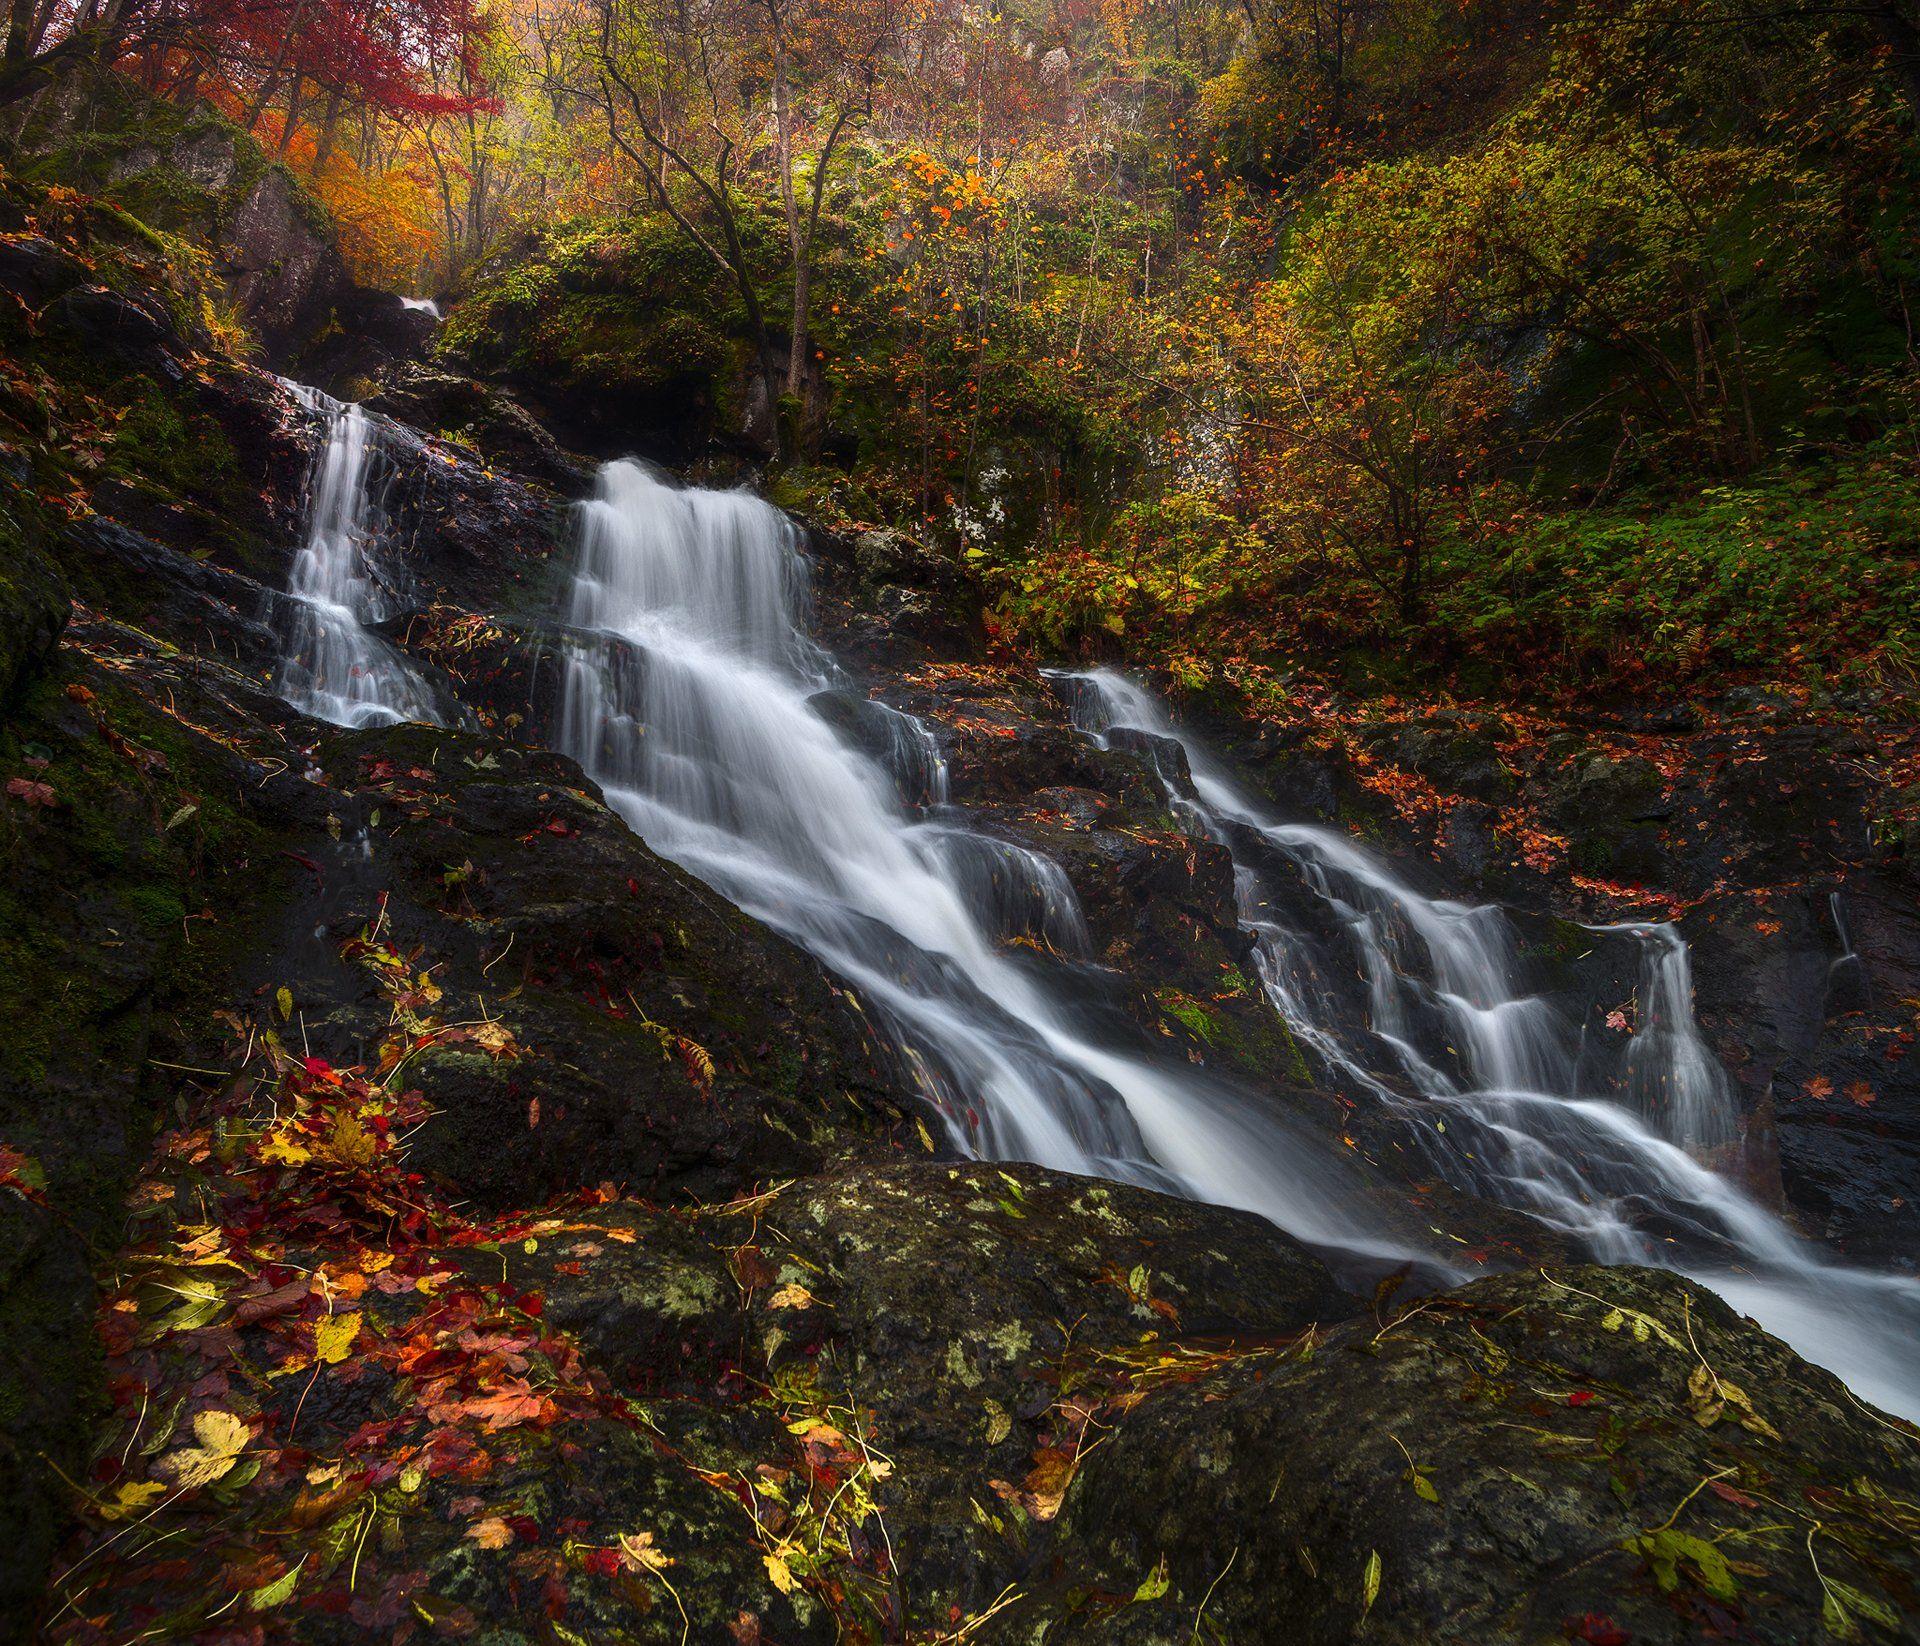 landscape nature scenery forest wood autumn river waterfall longexposure mountain vitosha bulgaria лес oсень, Александров Александър